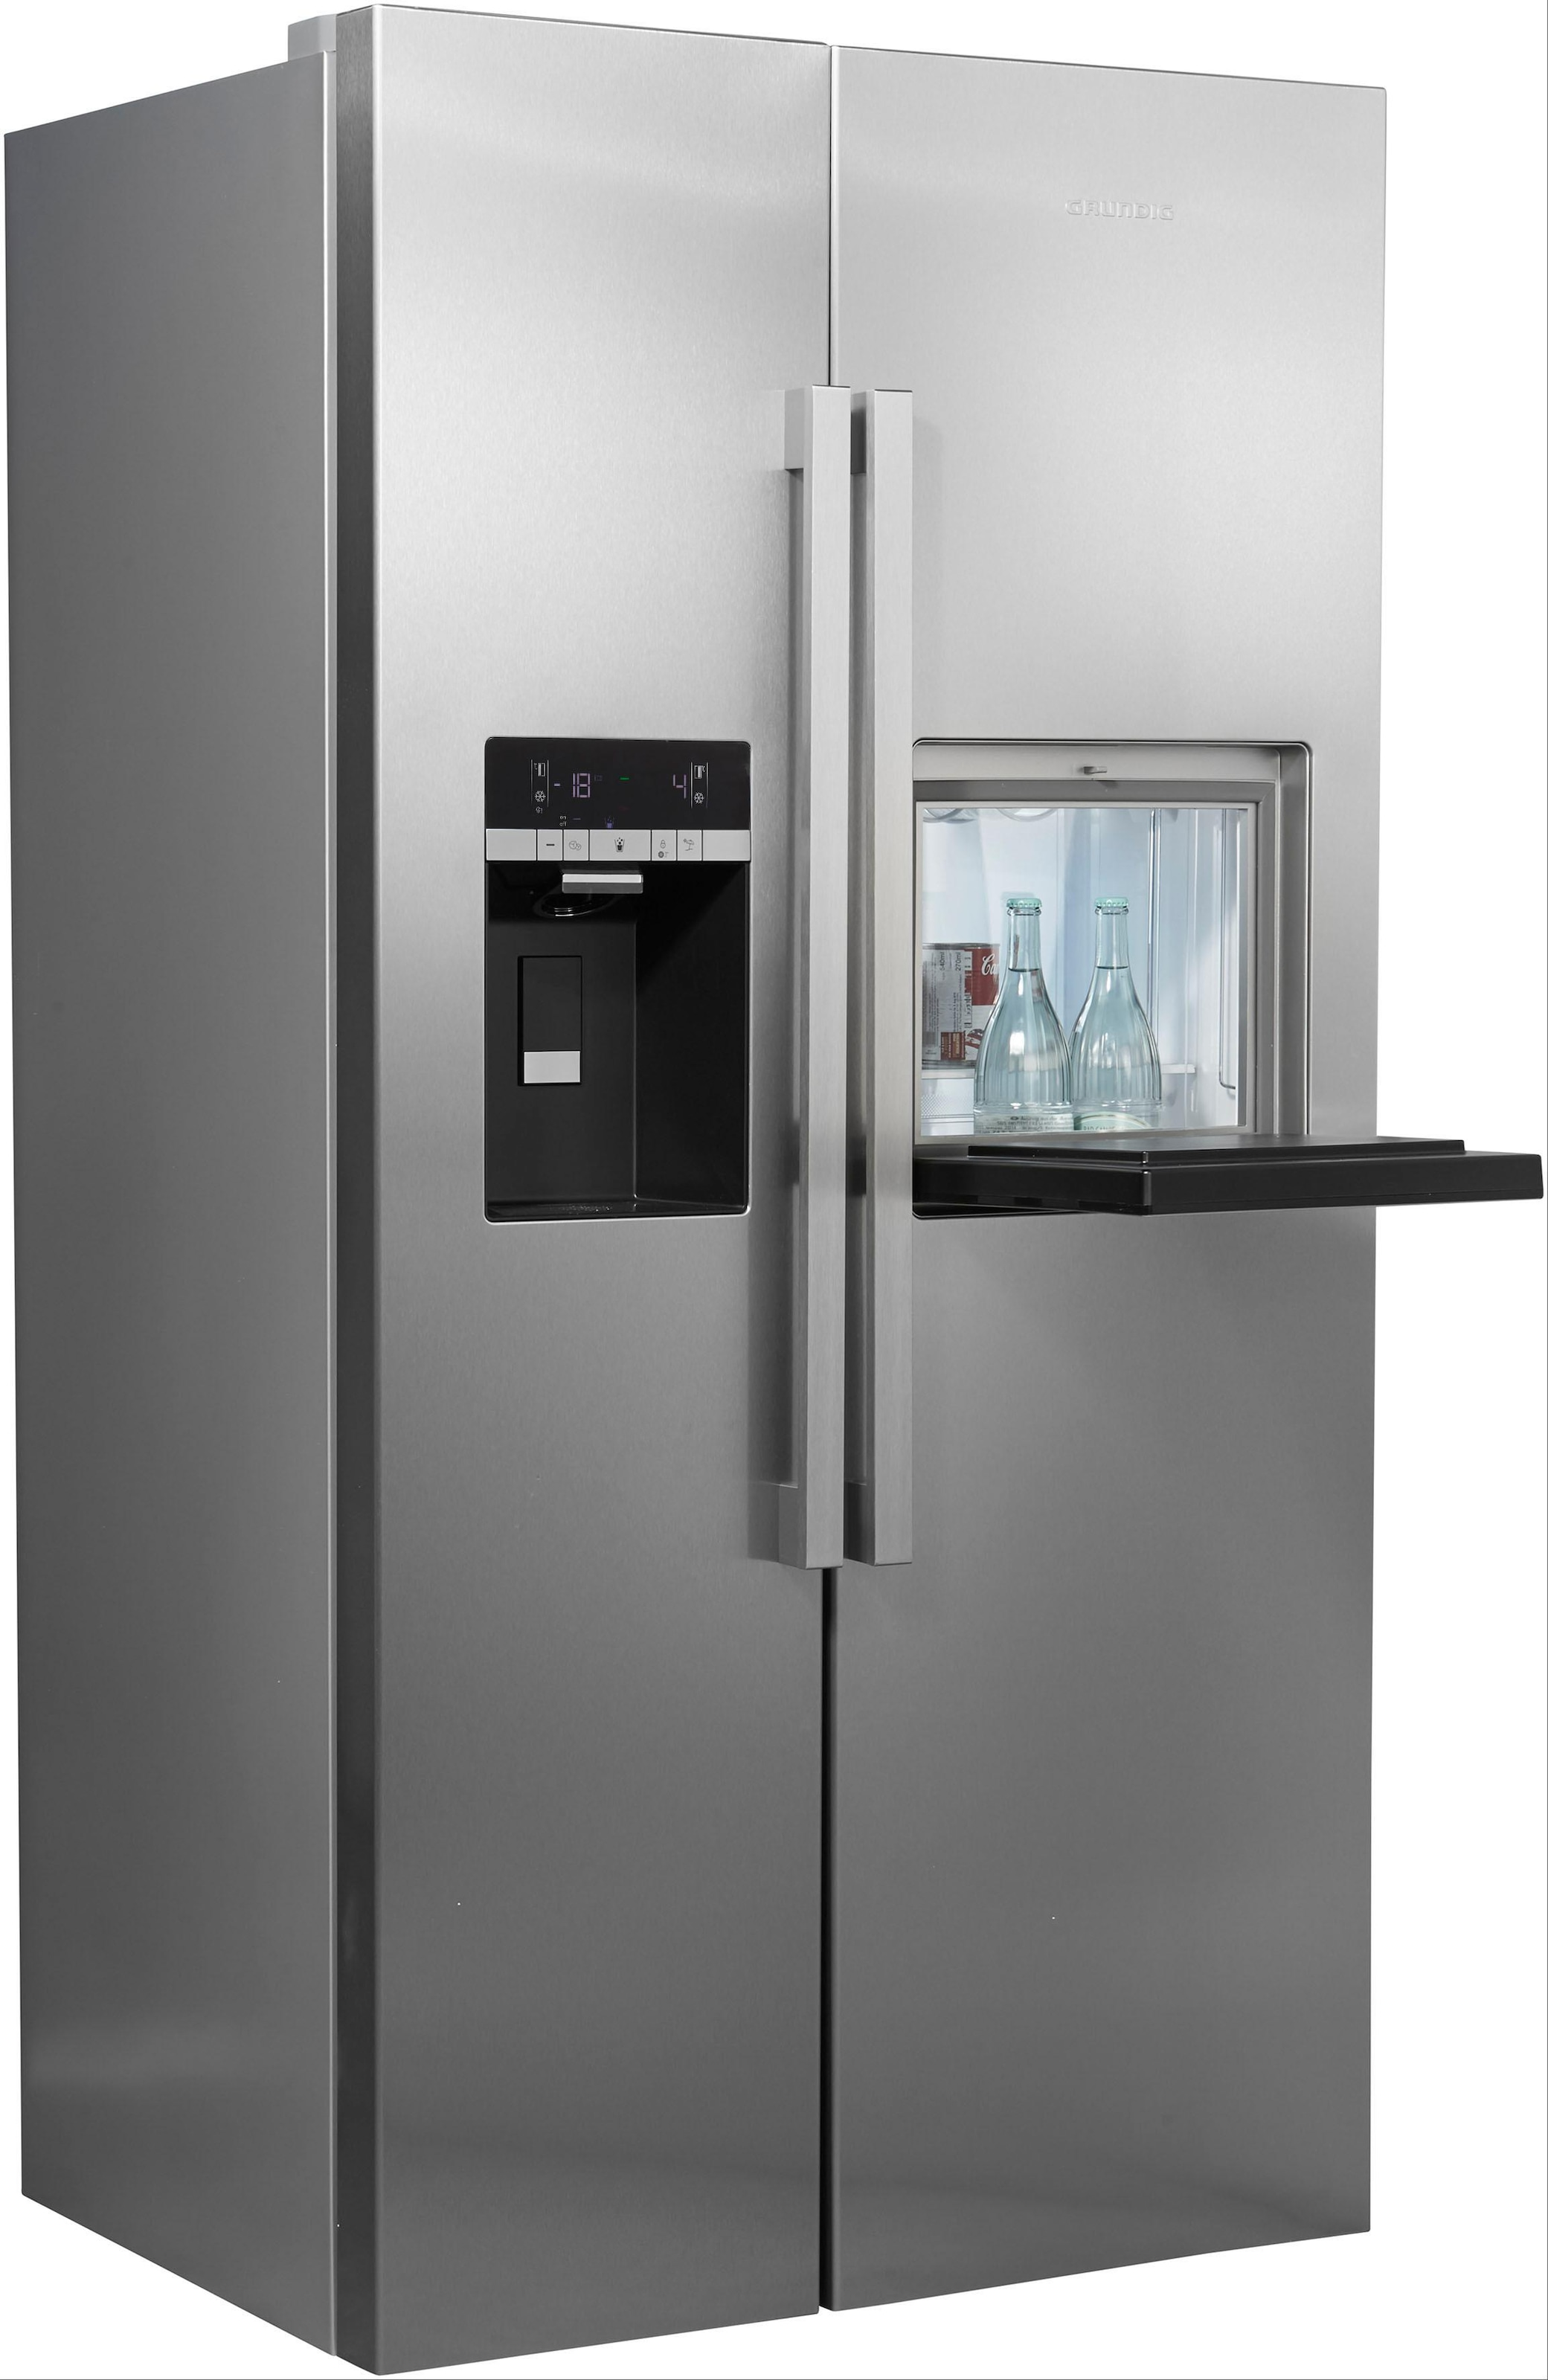 Grundig Kühlschrank Side By Side : Grundig side by side cm hoch cm breit per rechnung baur